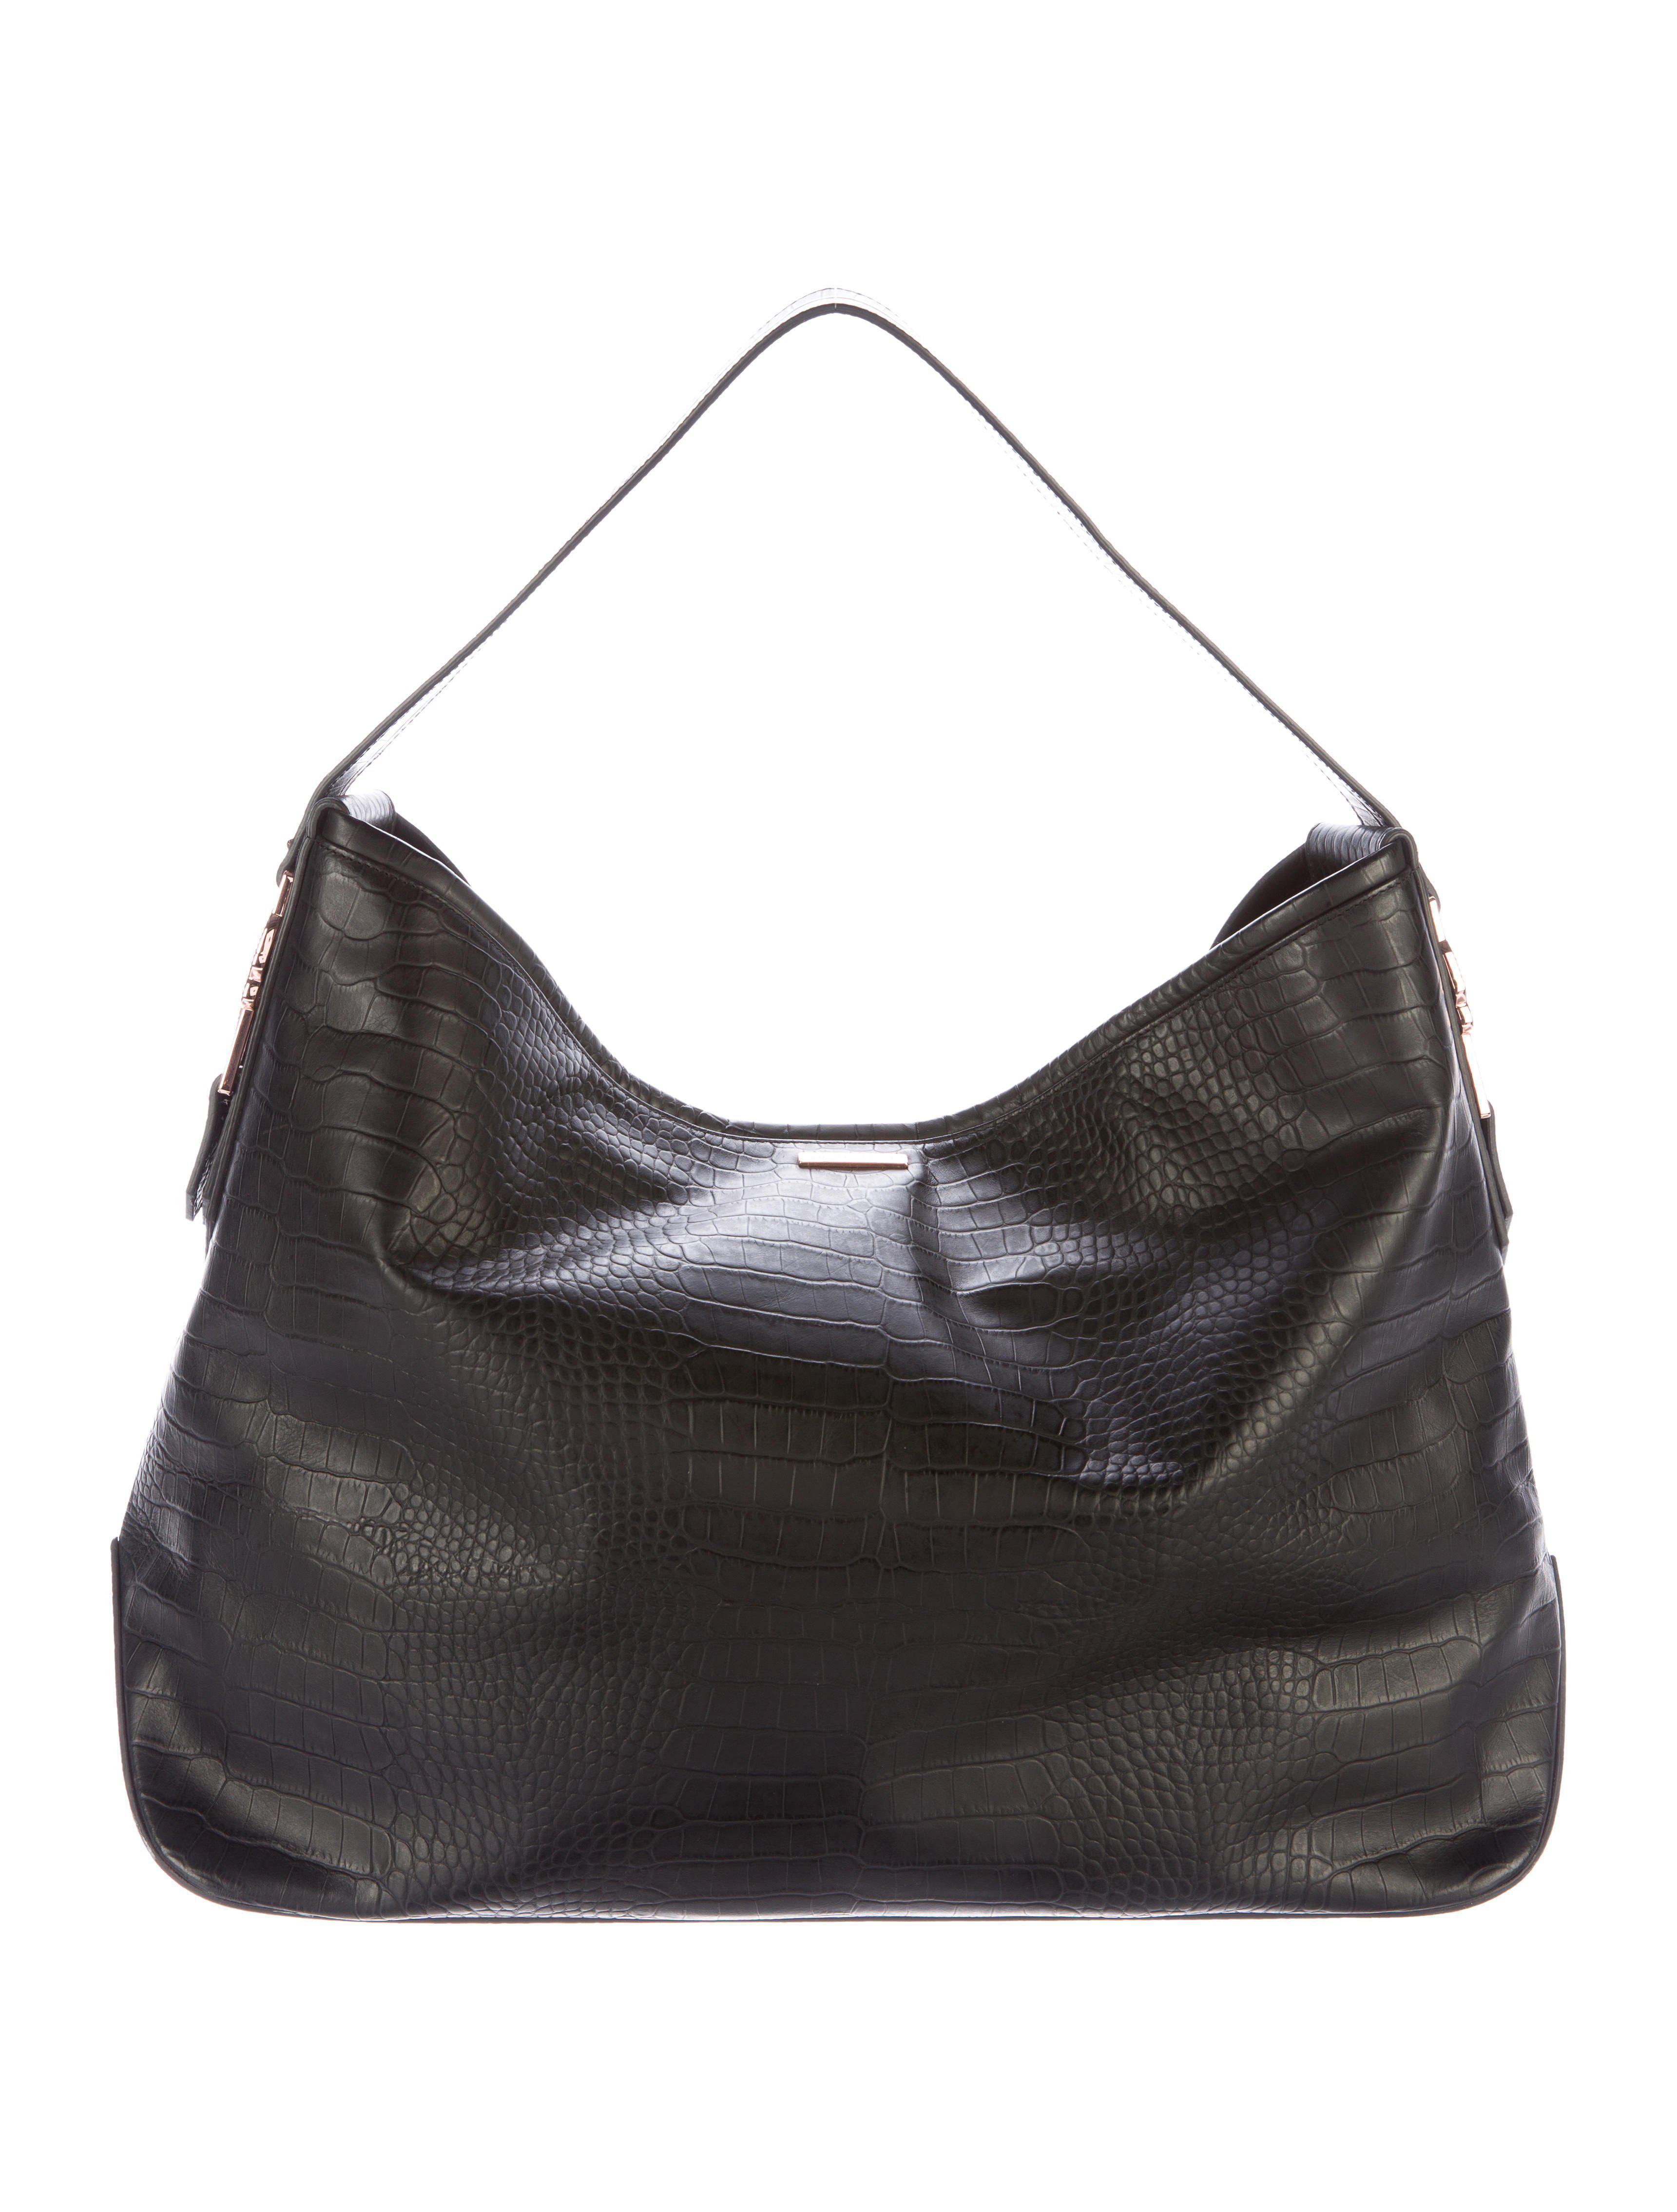 Lyst - Thomas Wylde Large Embossed Leather Hobo Black in Metallic df3b79ac635d3